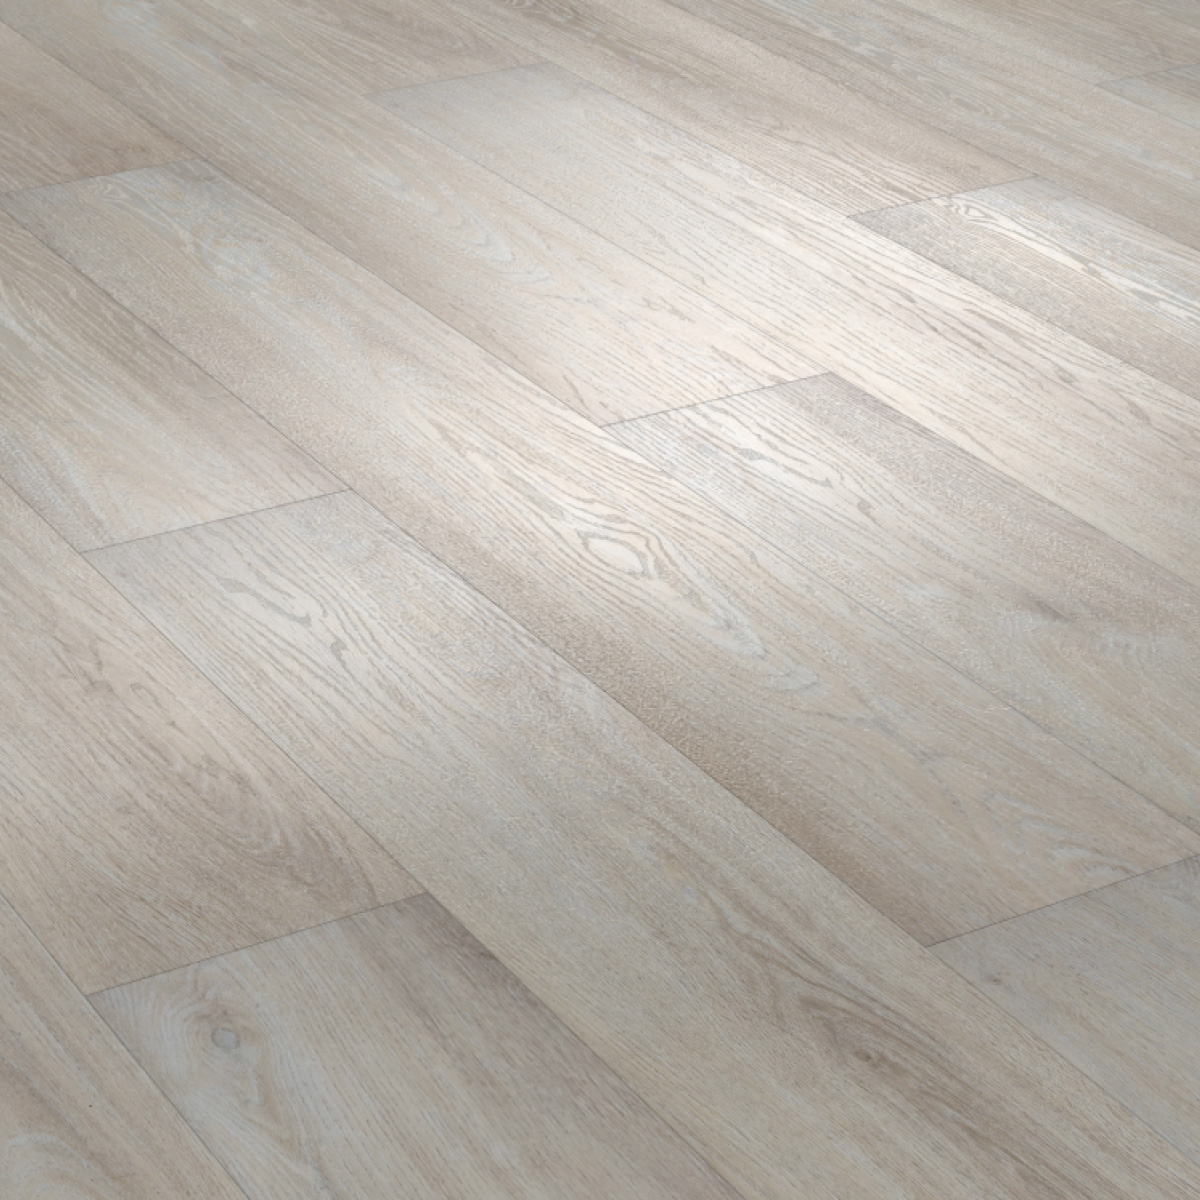 Vinylová podlaha Afirmax HD mineral core - Dub Vermont